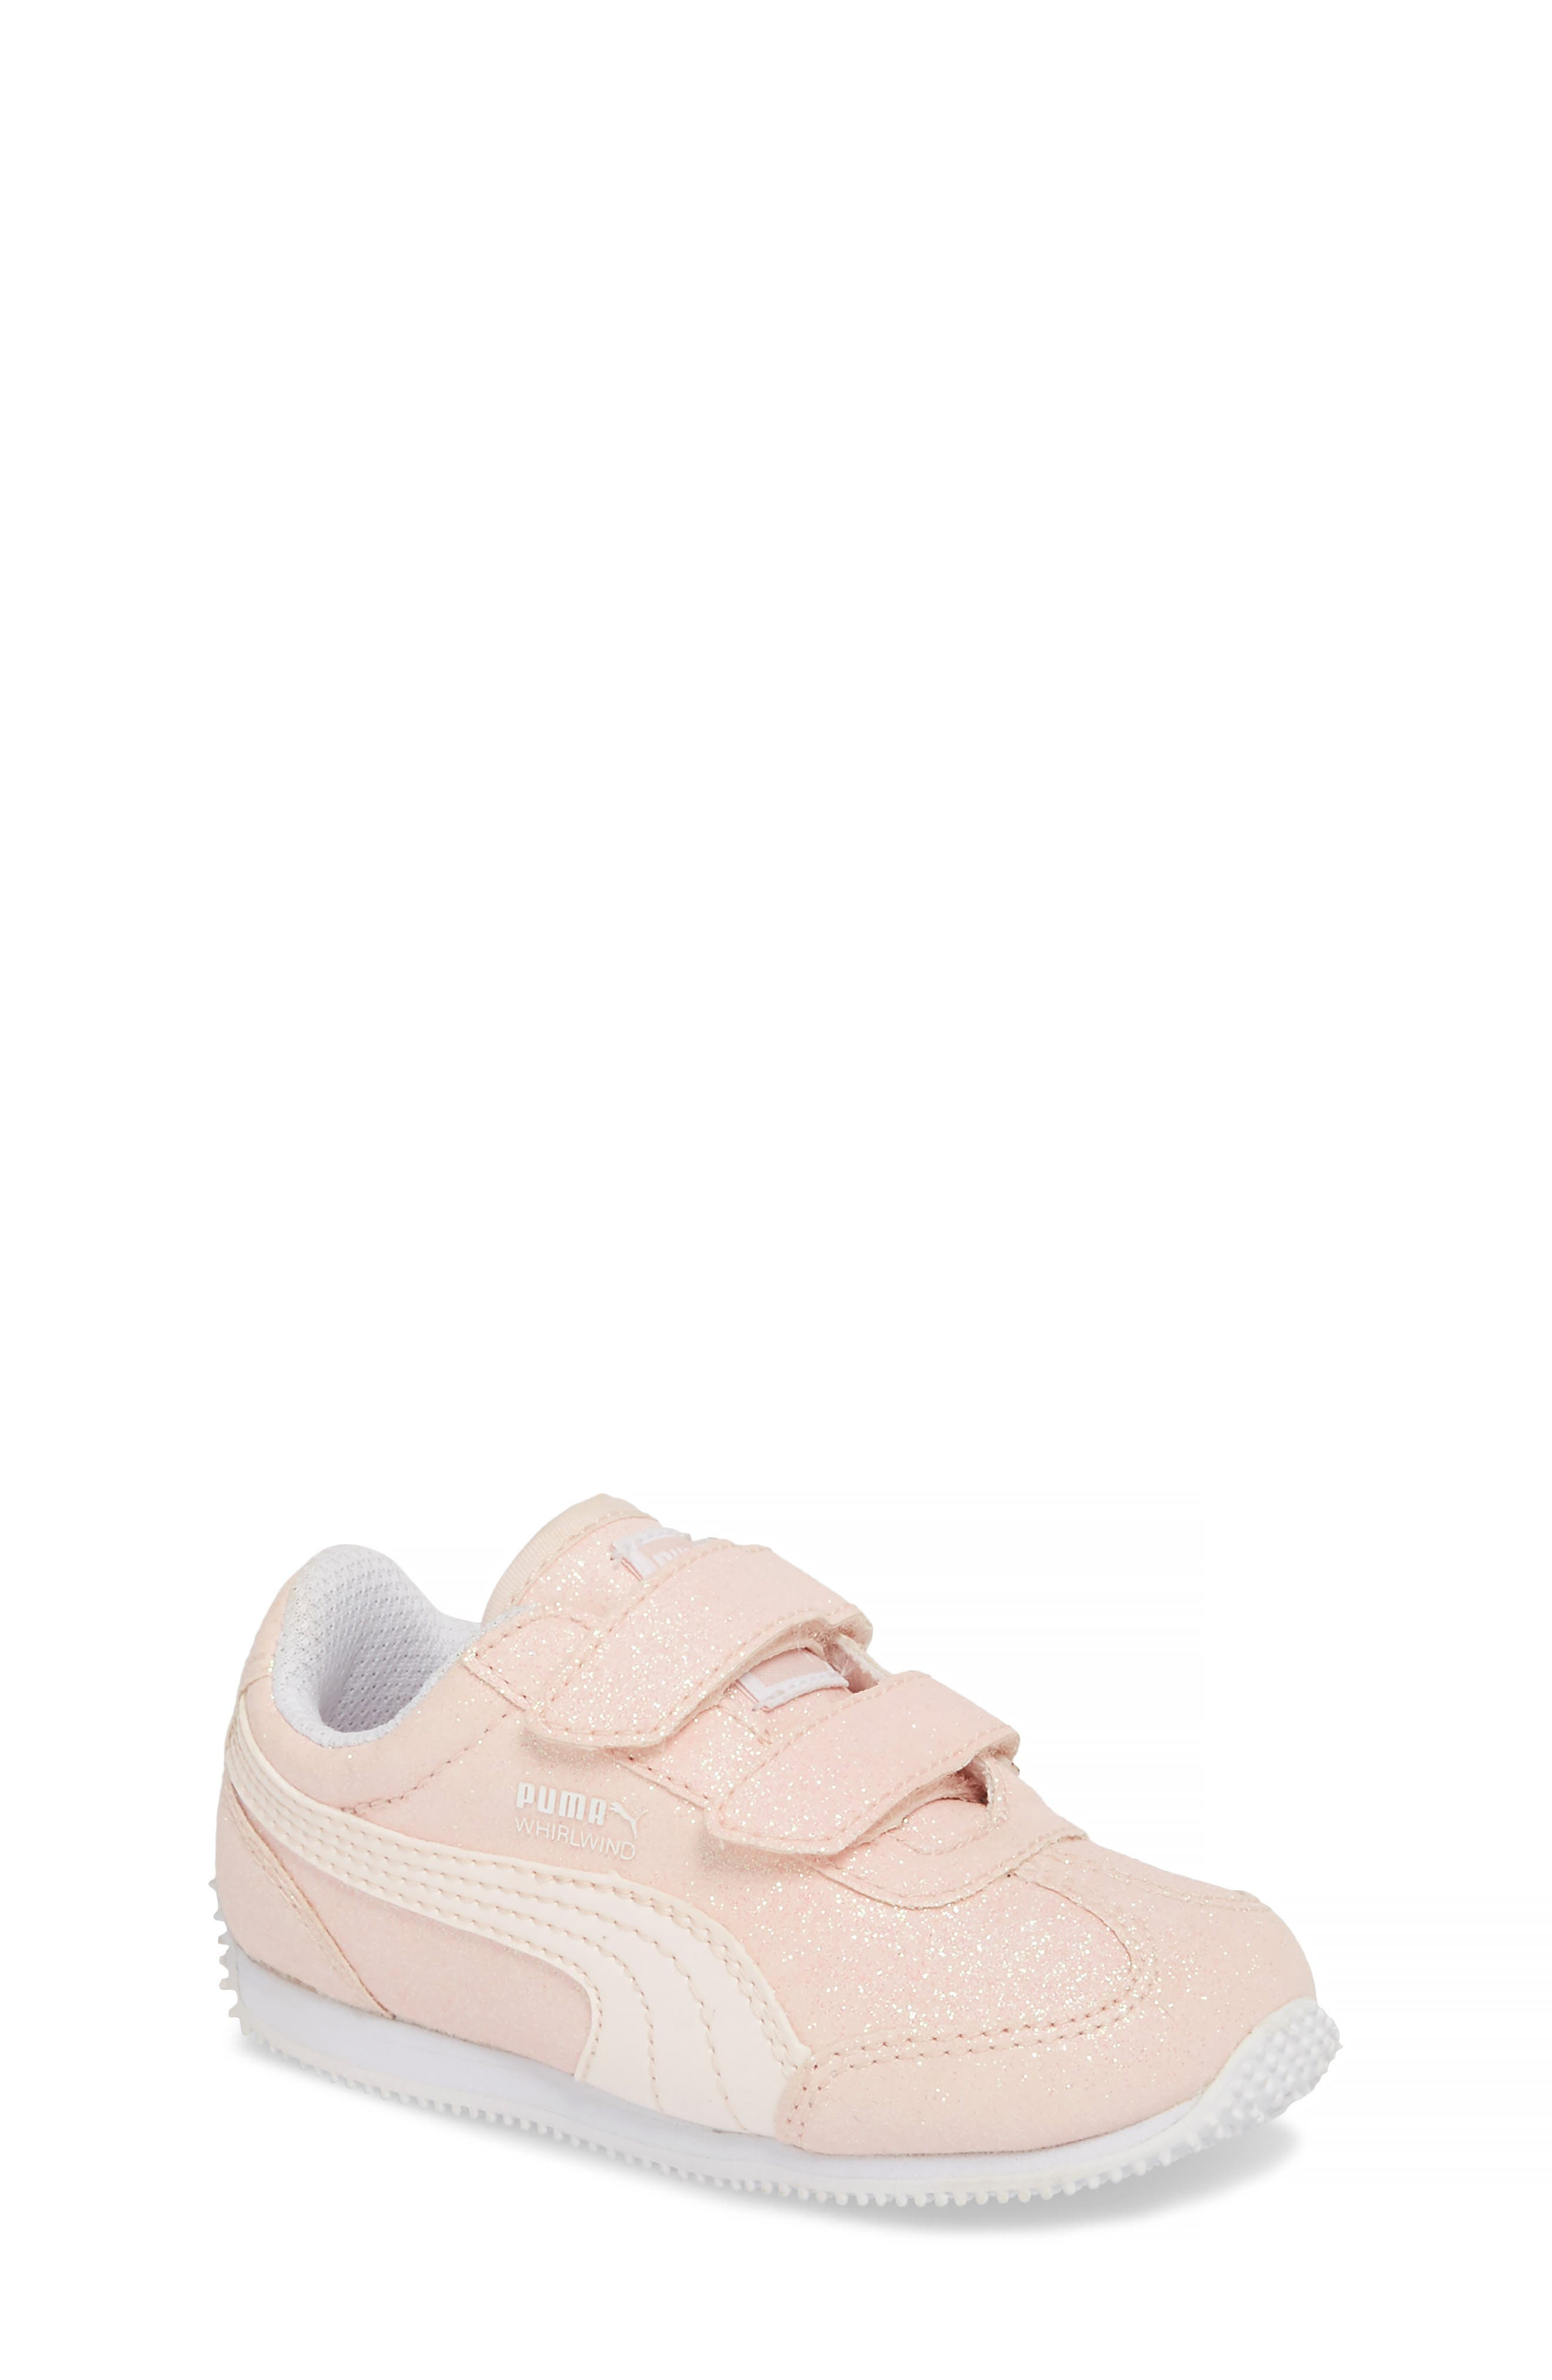 PUMA, Whirlwind Glitz Sneaker, Main thumbnail 1, color, 690